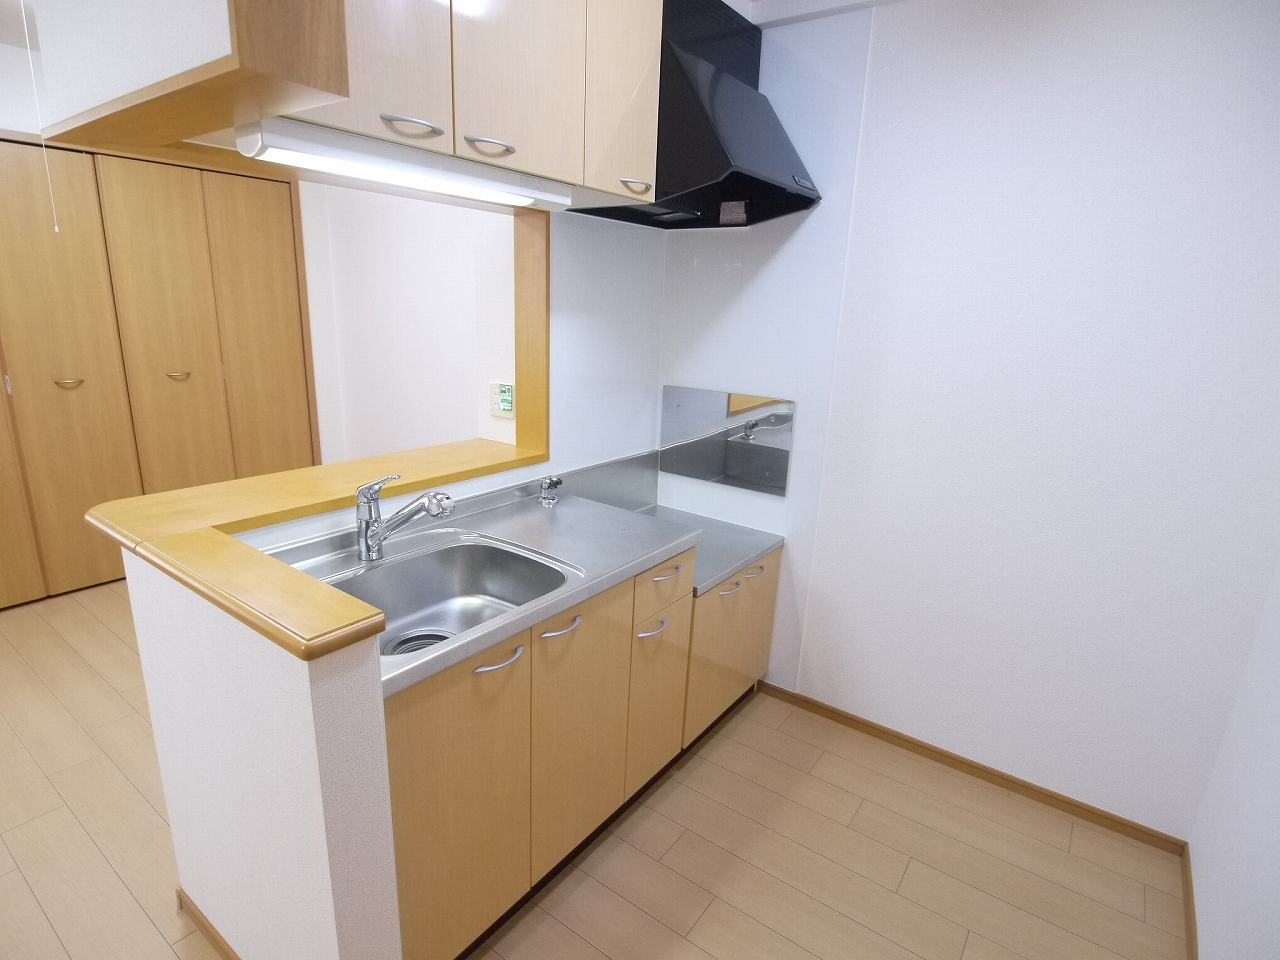 scops府庁前 103号室のキッチン